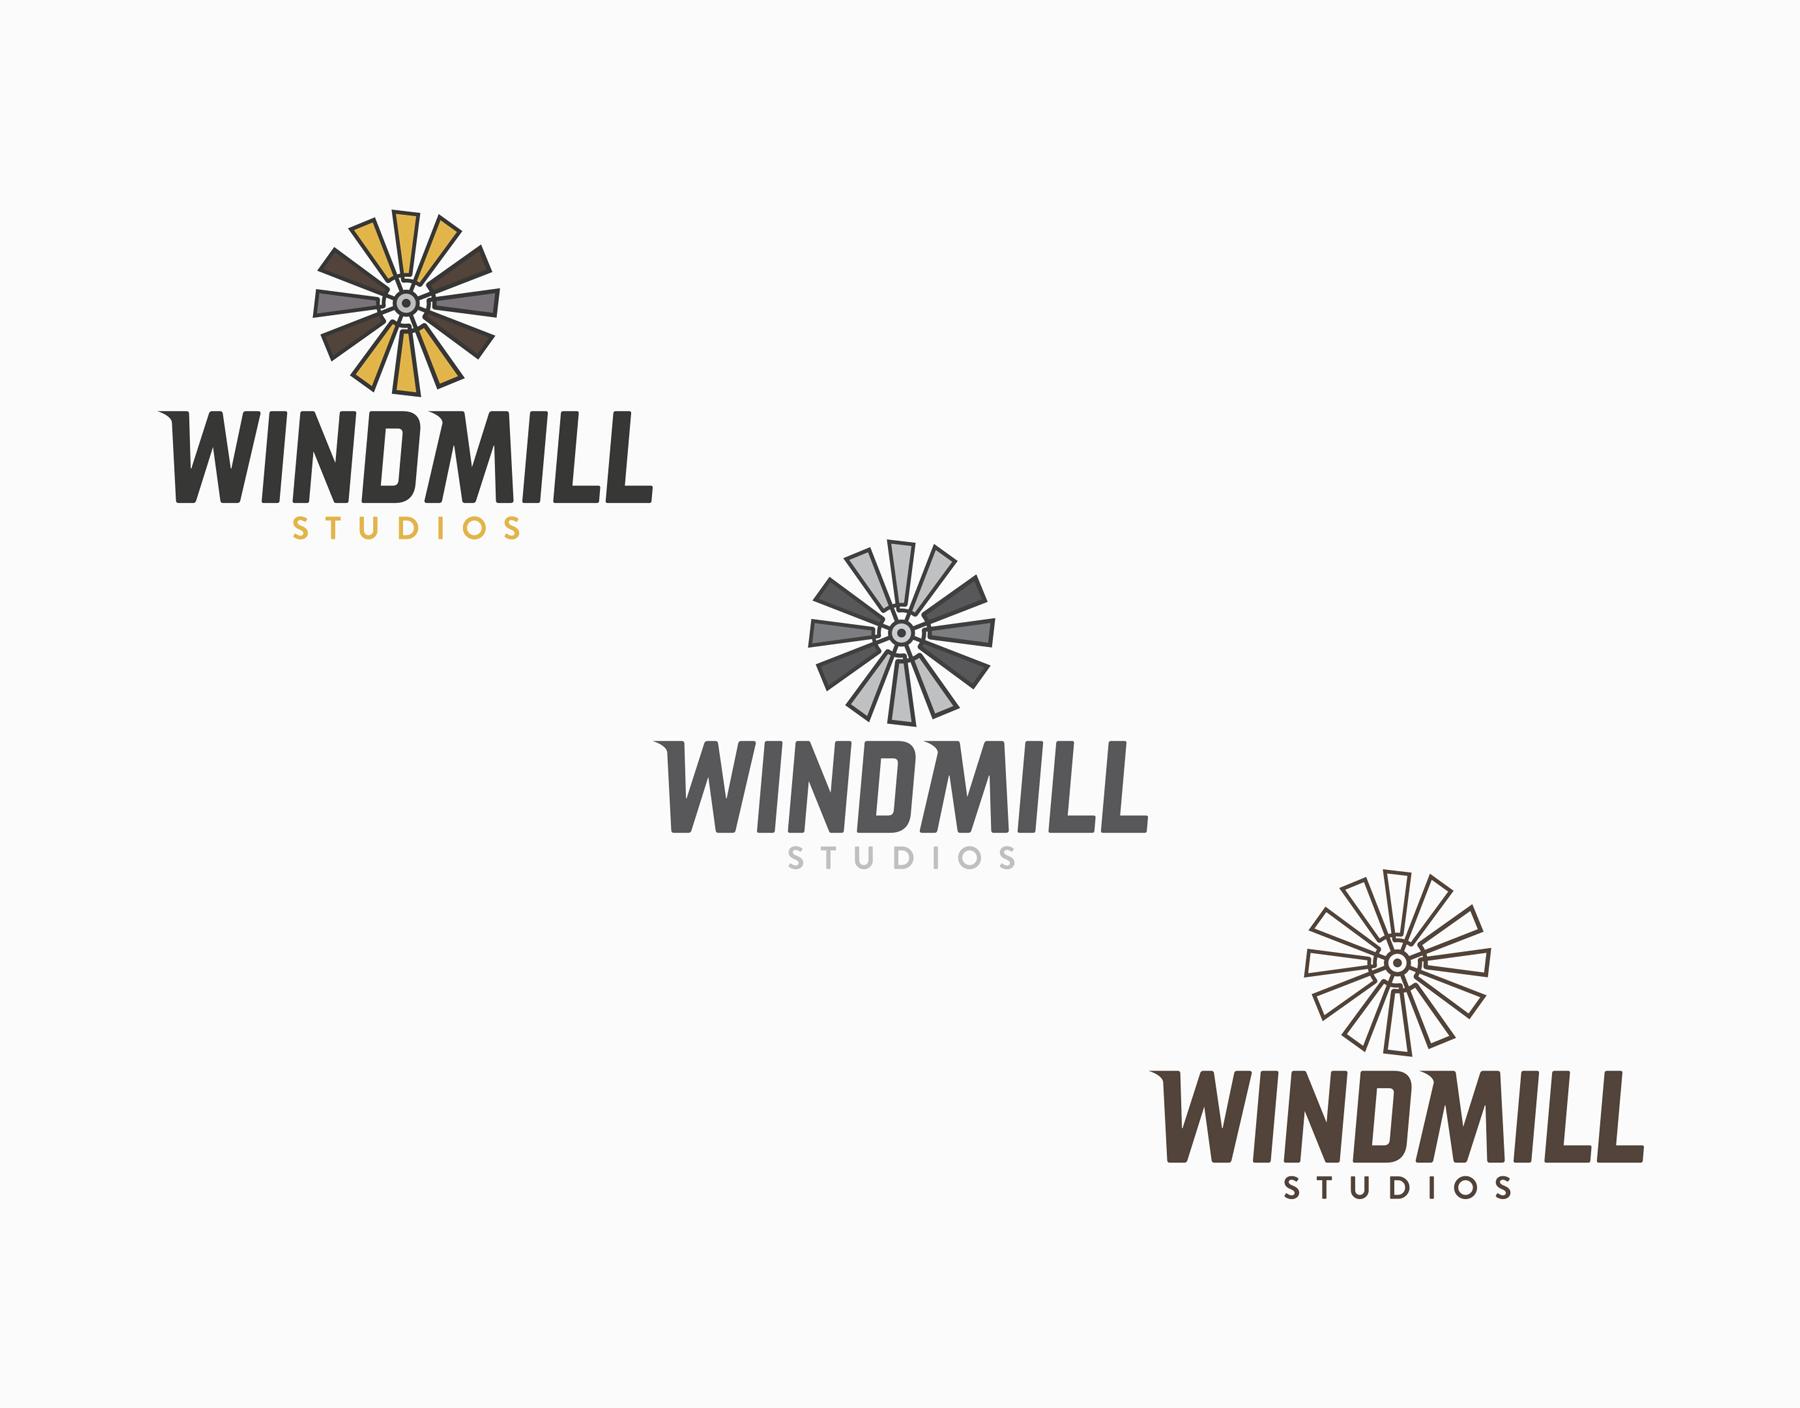 Windmill Studio Brand Identity